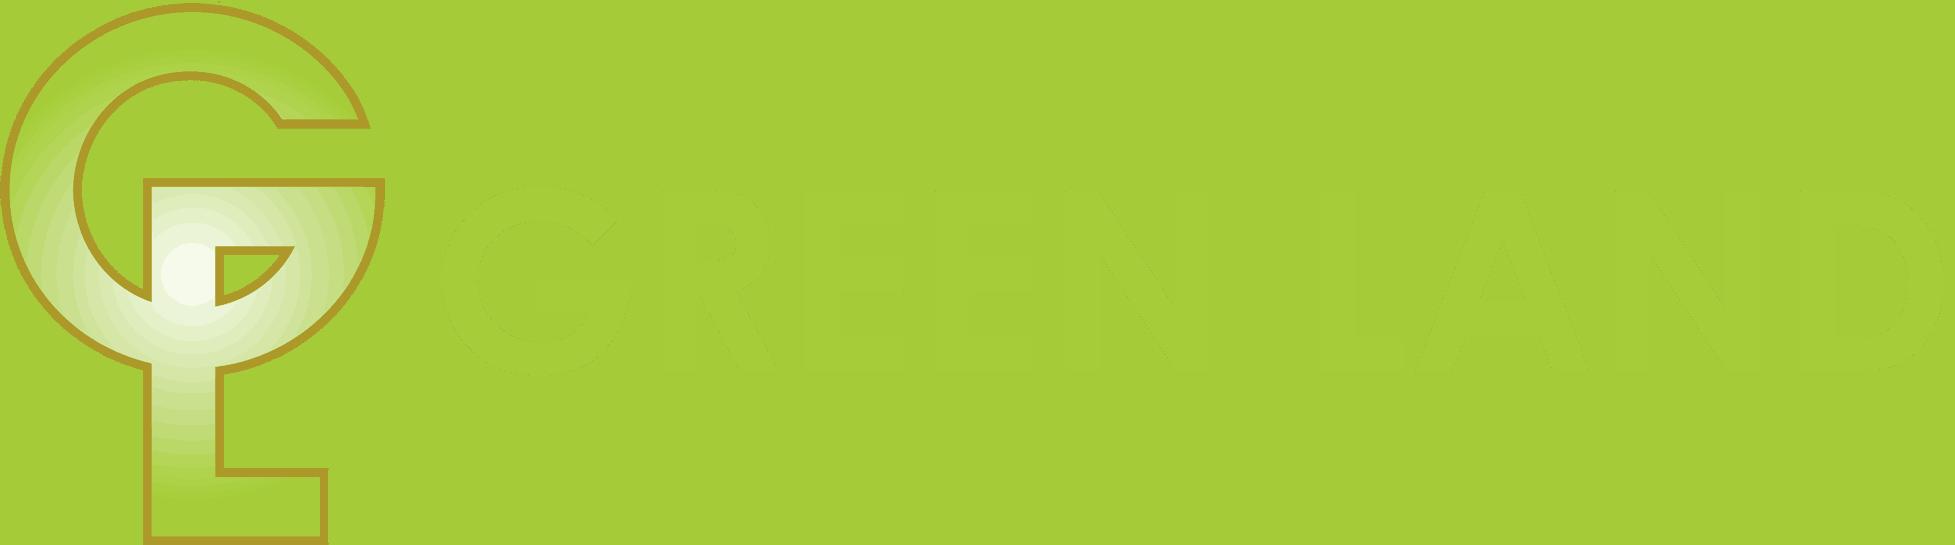 Green Land Logistic